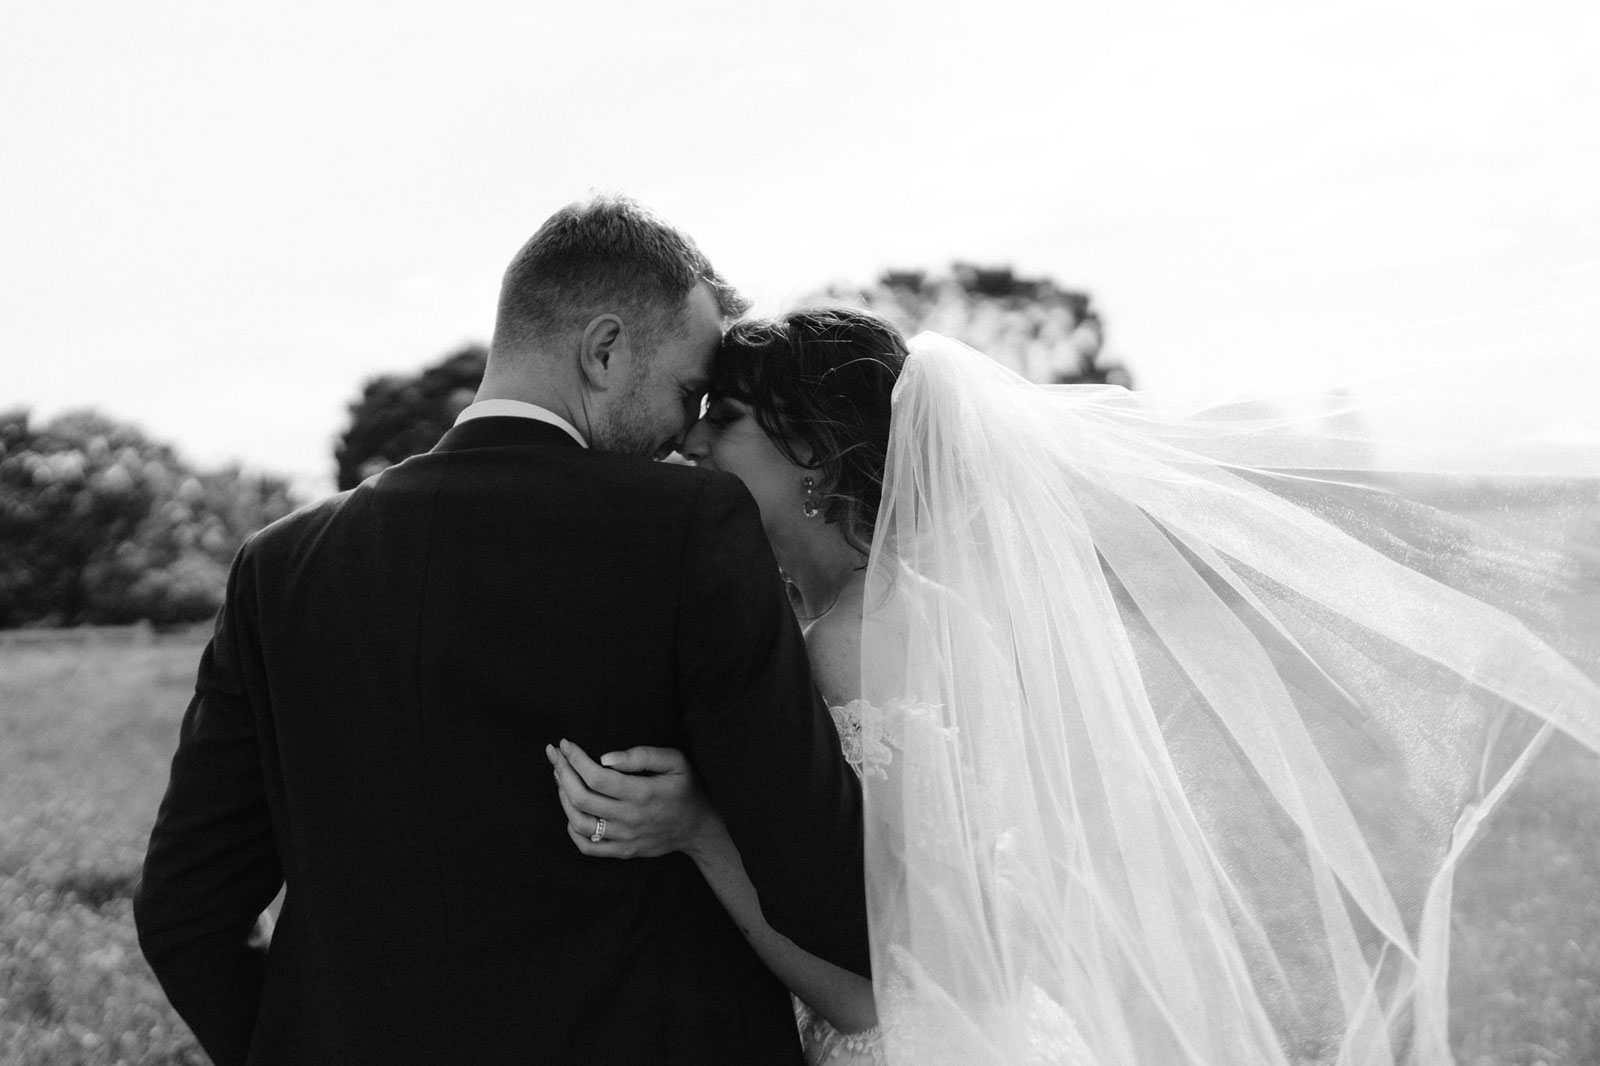 newfound-n-c-olive-tree-cottage-tauranga-wedding-photographer-755